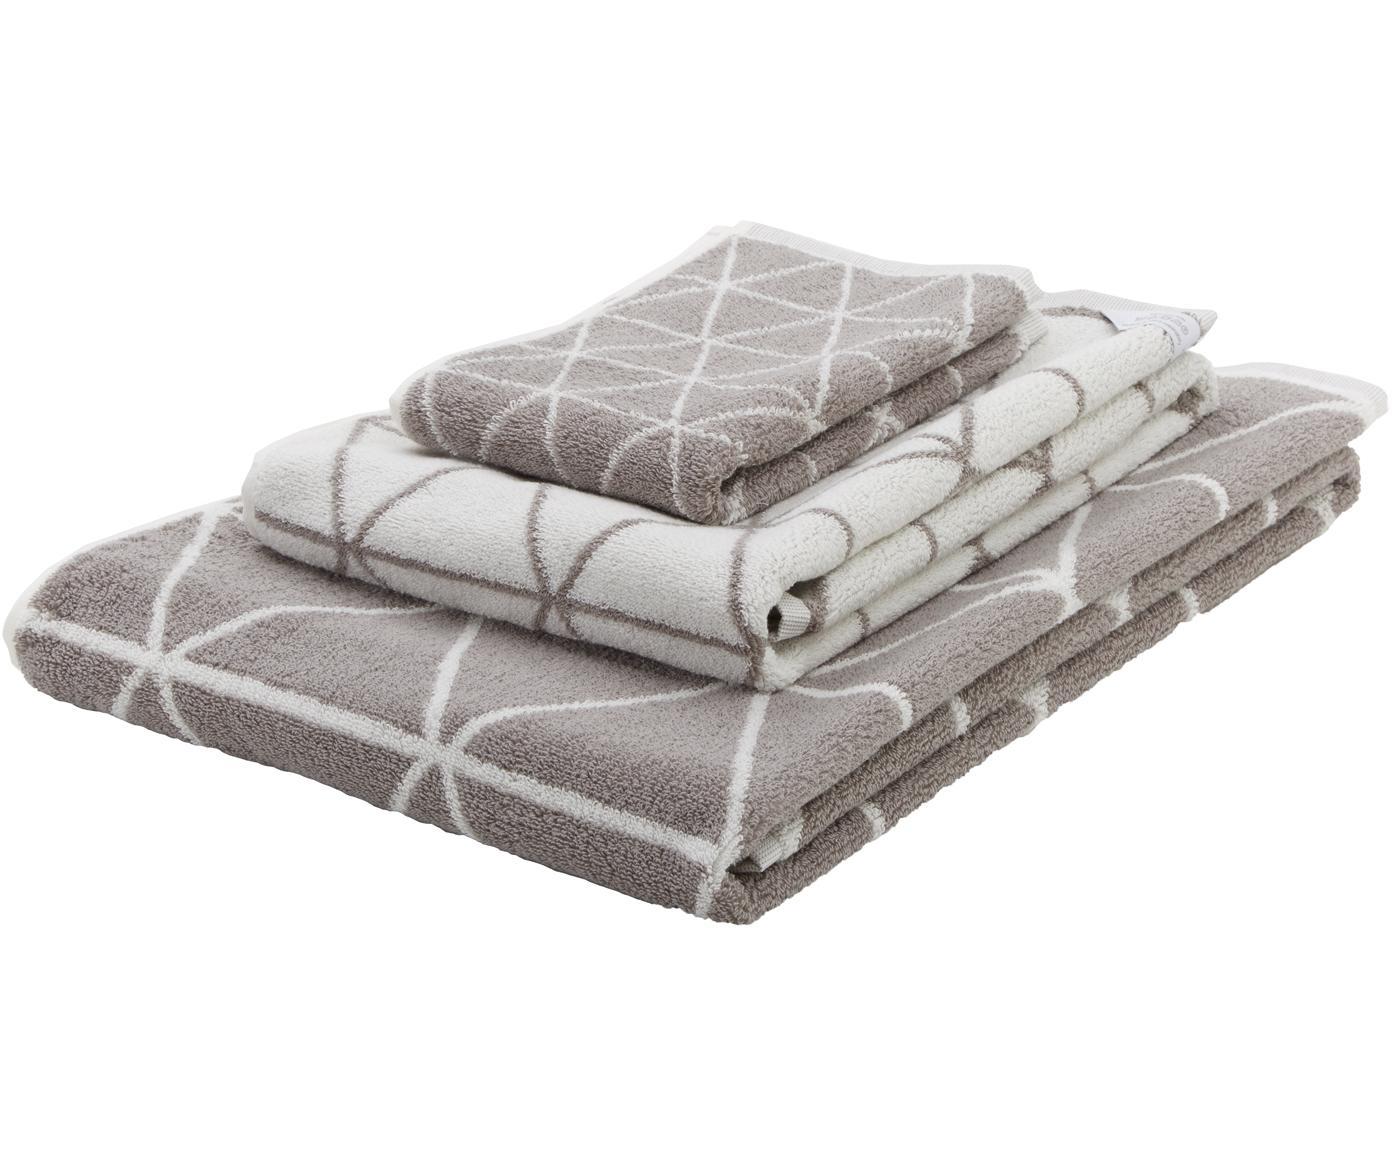 Set 3 asciugamani reversibili Elina, Grigio, bianco crema, Diverse dimensioni